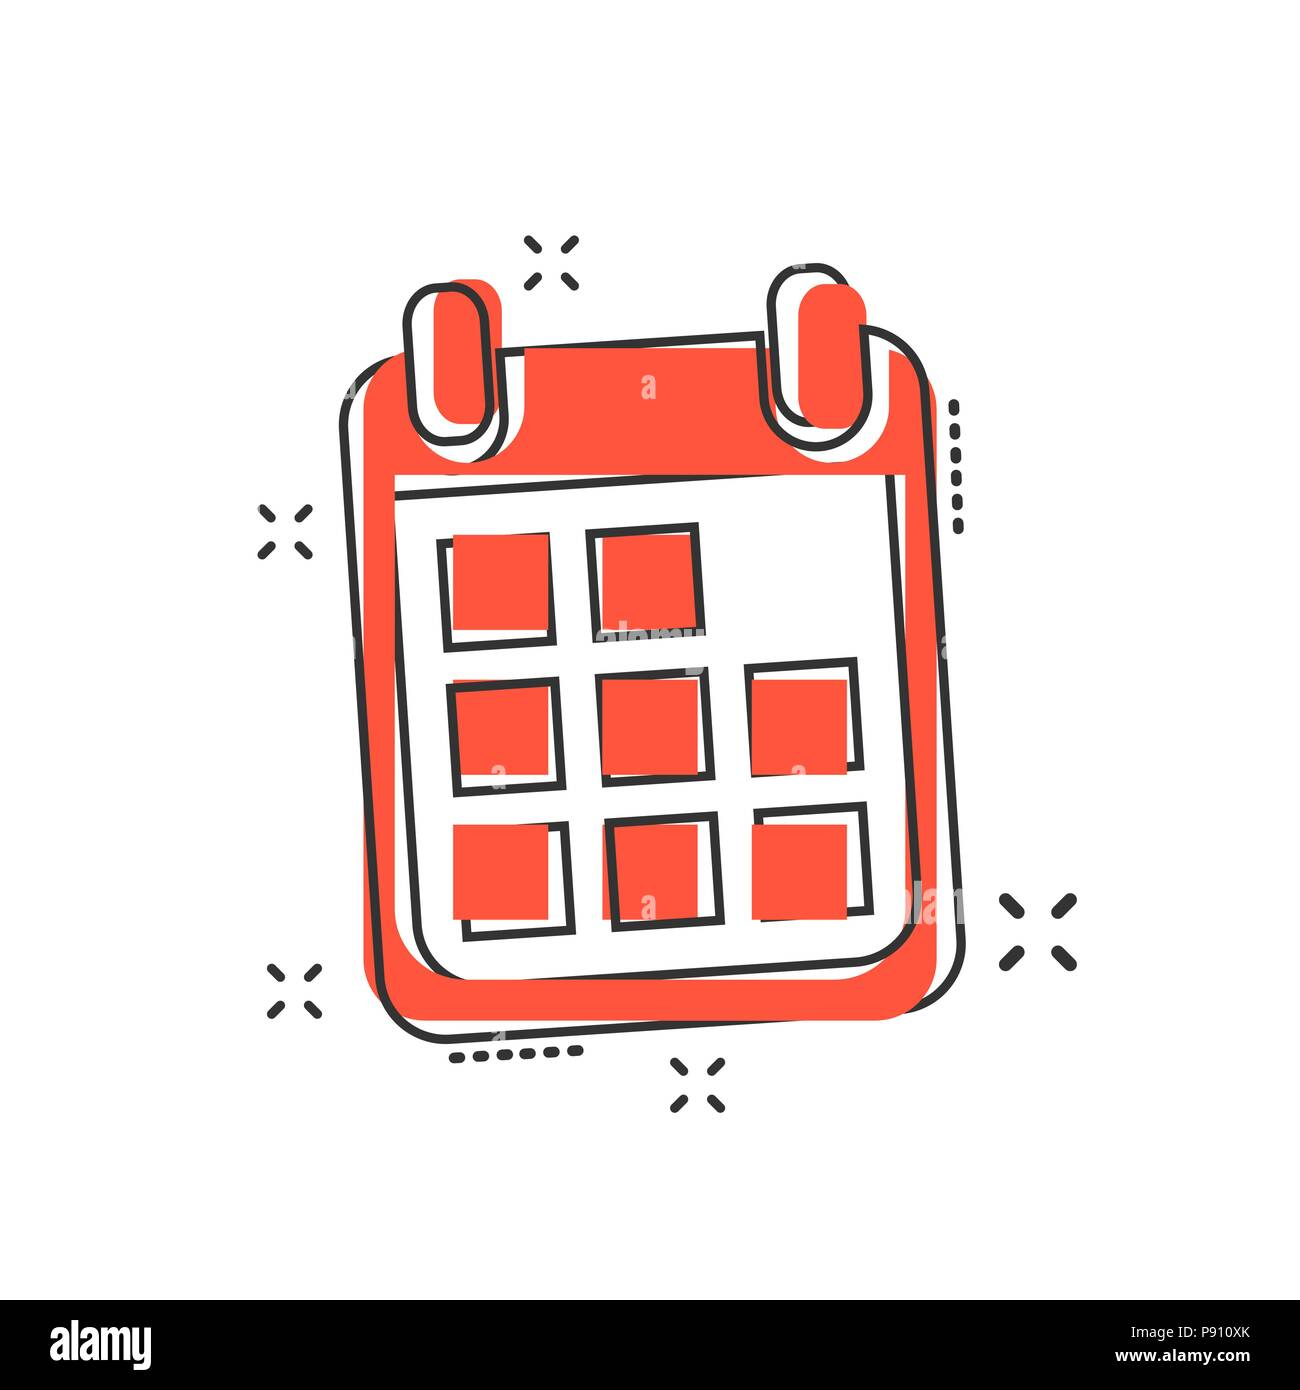 Calendario Icona.Vector Cartoon Icona Calendario In Stile Fumetto Segno Del